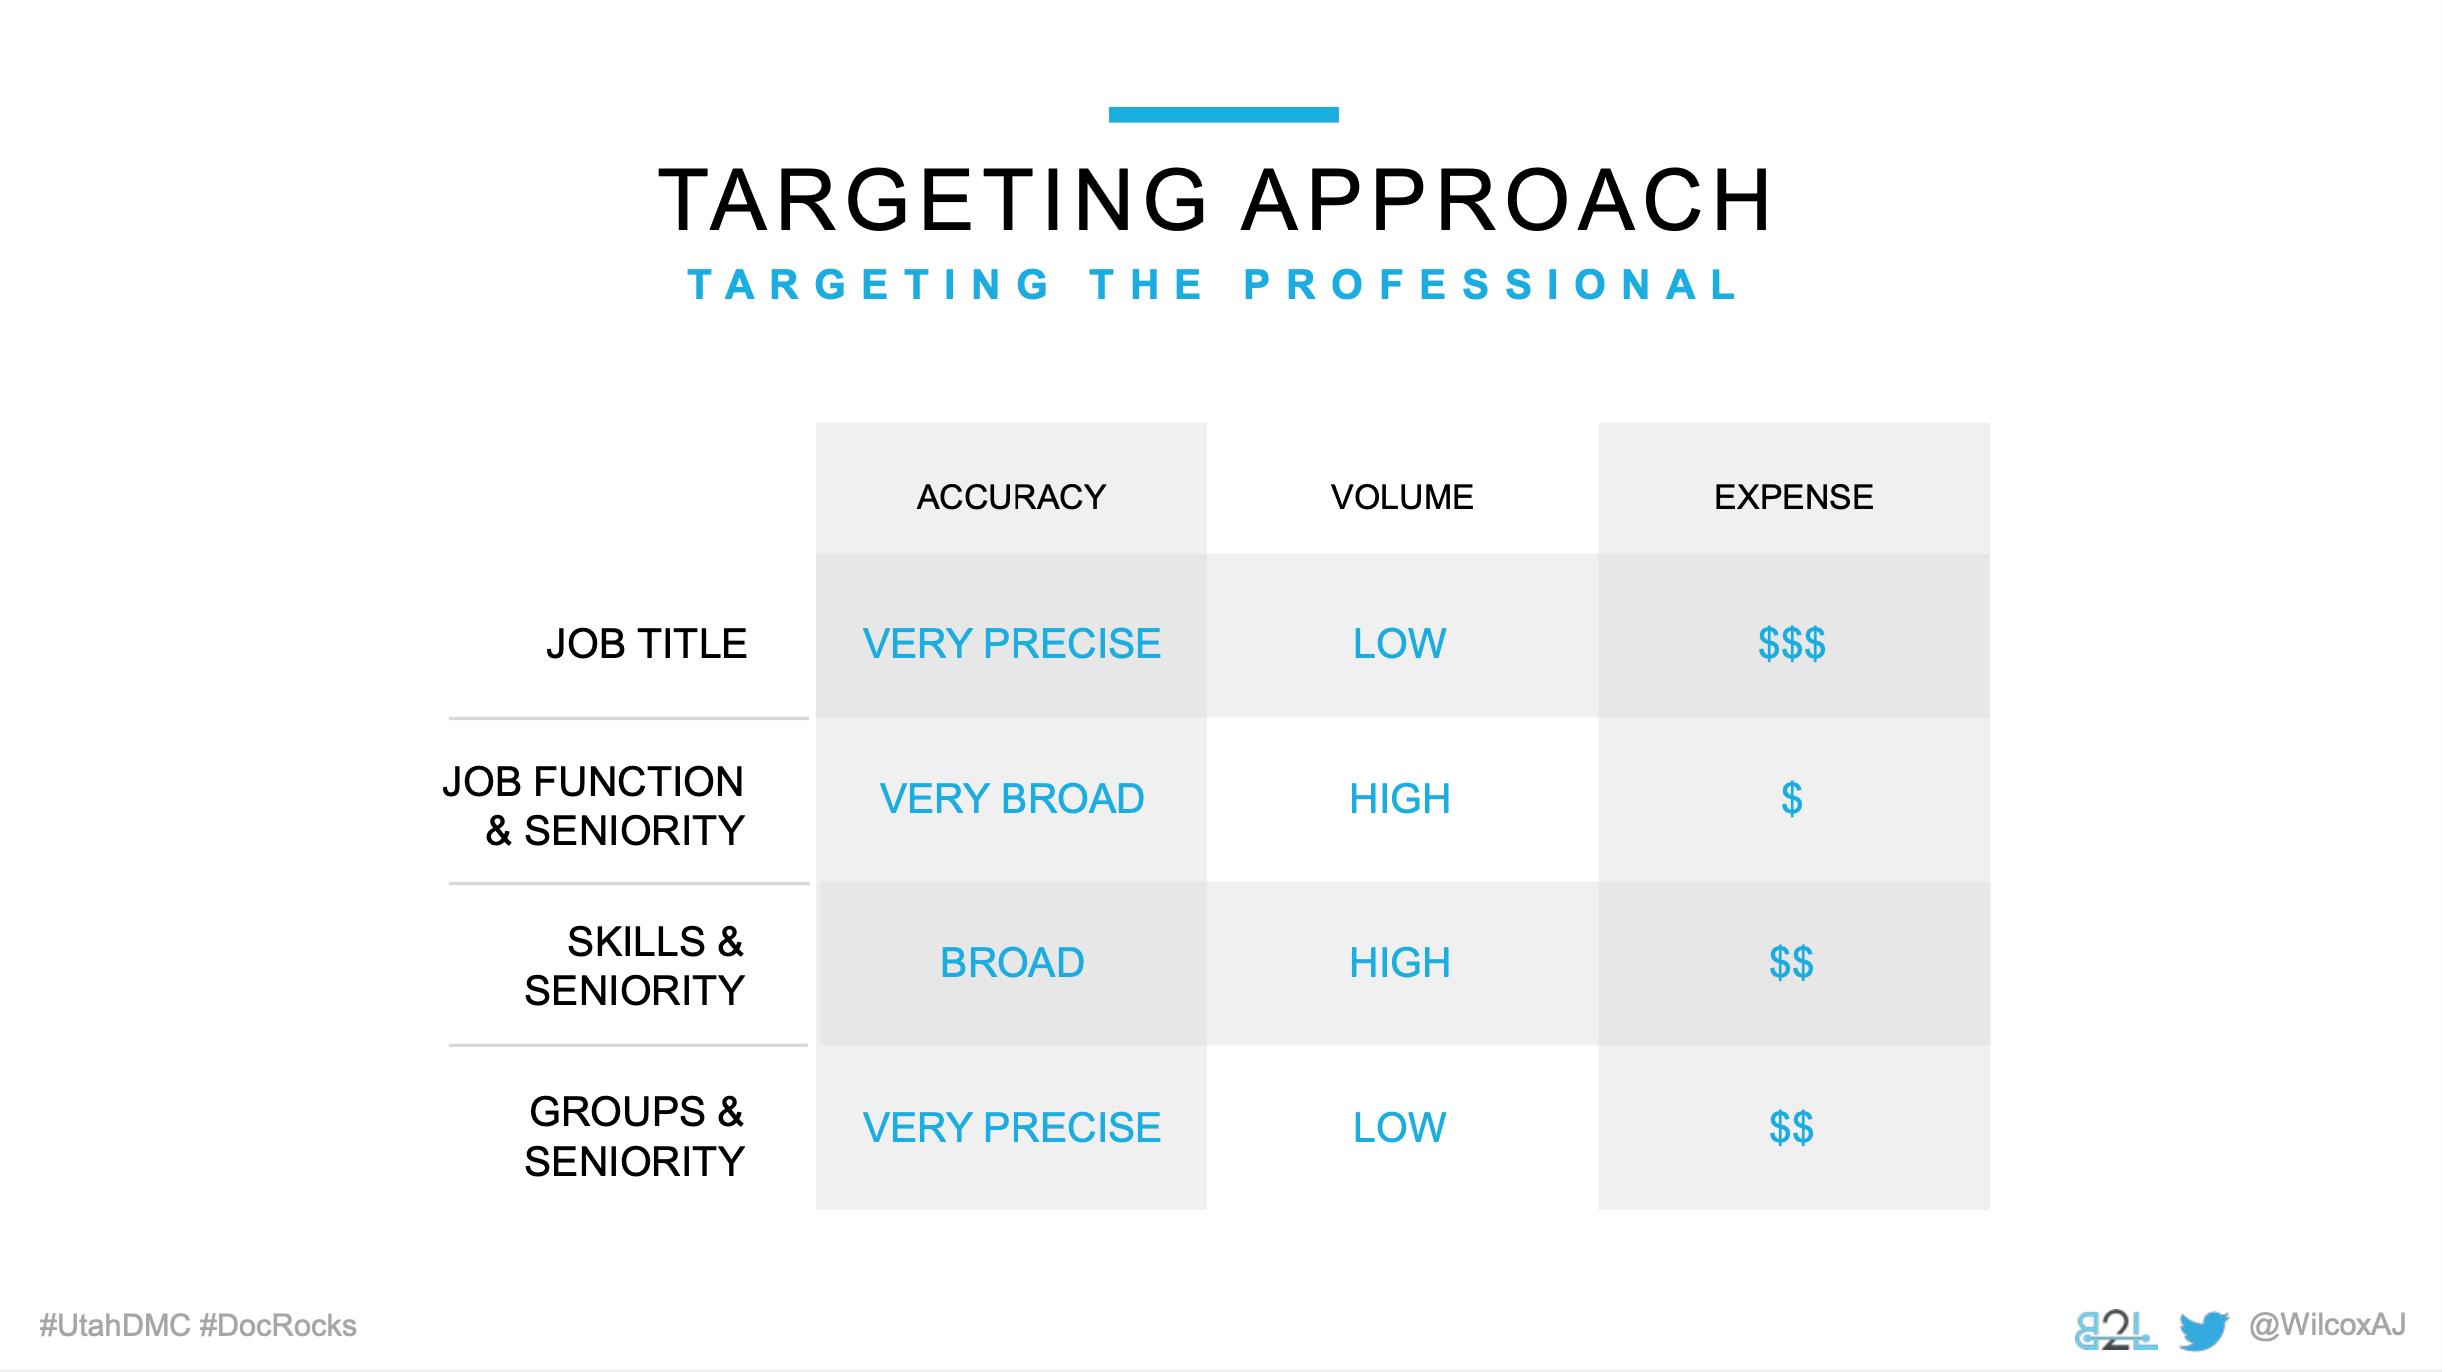 Utah DMC LinkedIn Ads - Aj Wilcox - Ad Units - Targeting Approach